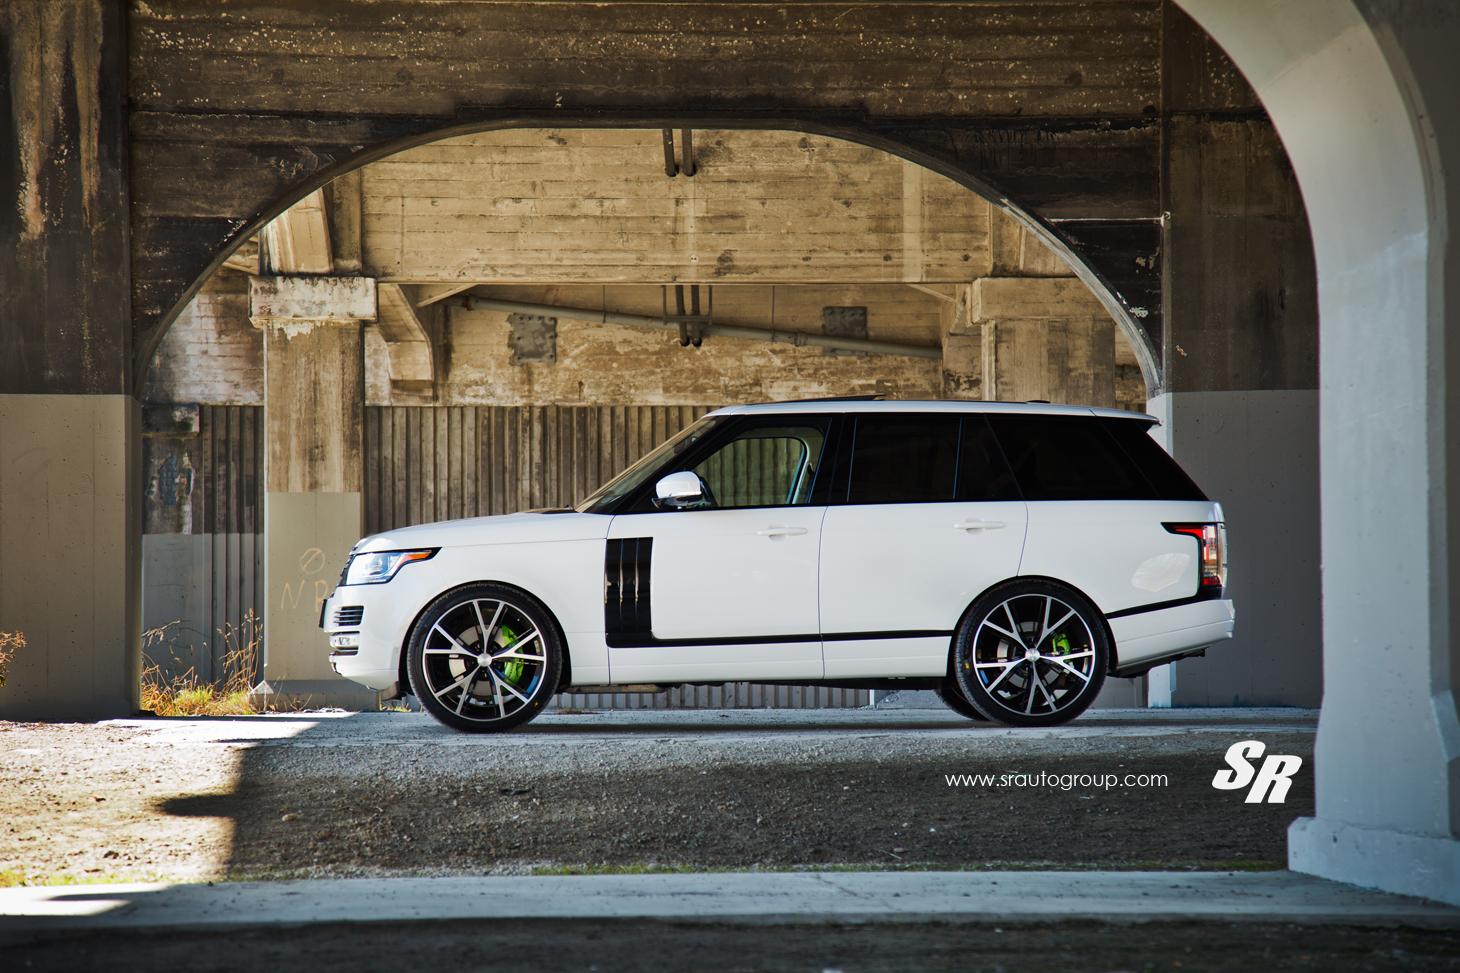 New Range Rover >> 2013 Range Rover Gets PUR Wheels, Lambo-Green Calipers - autoevolution